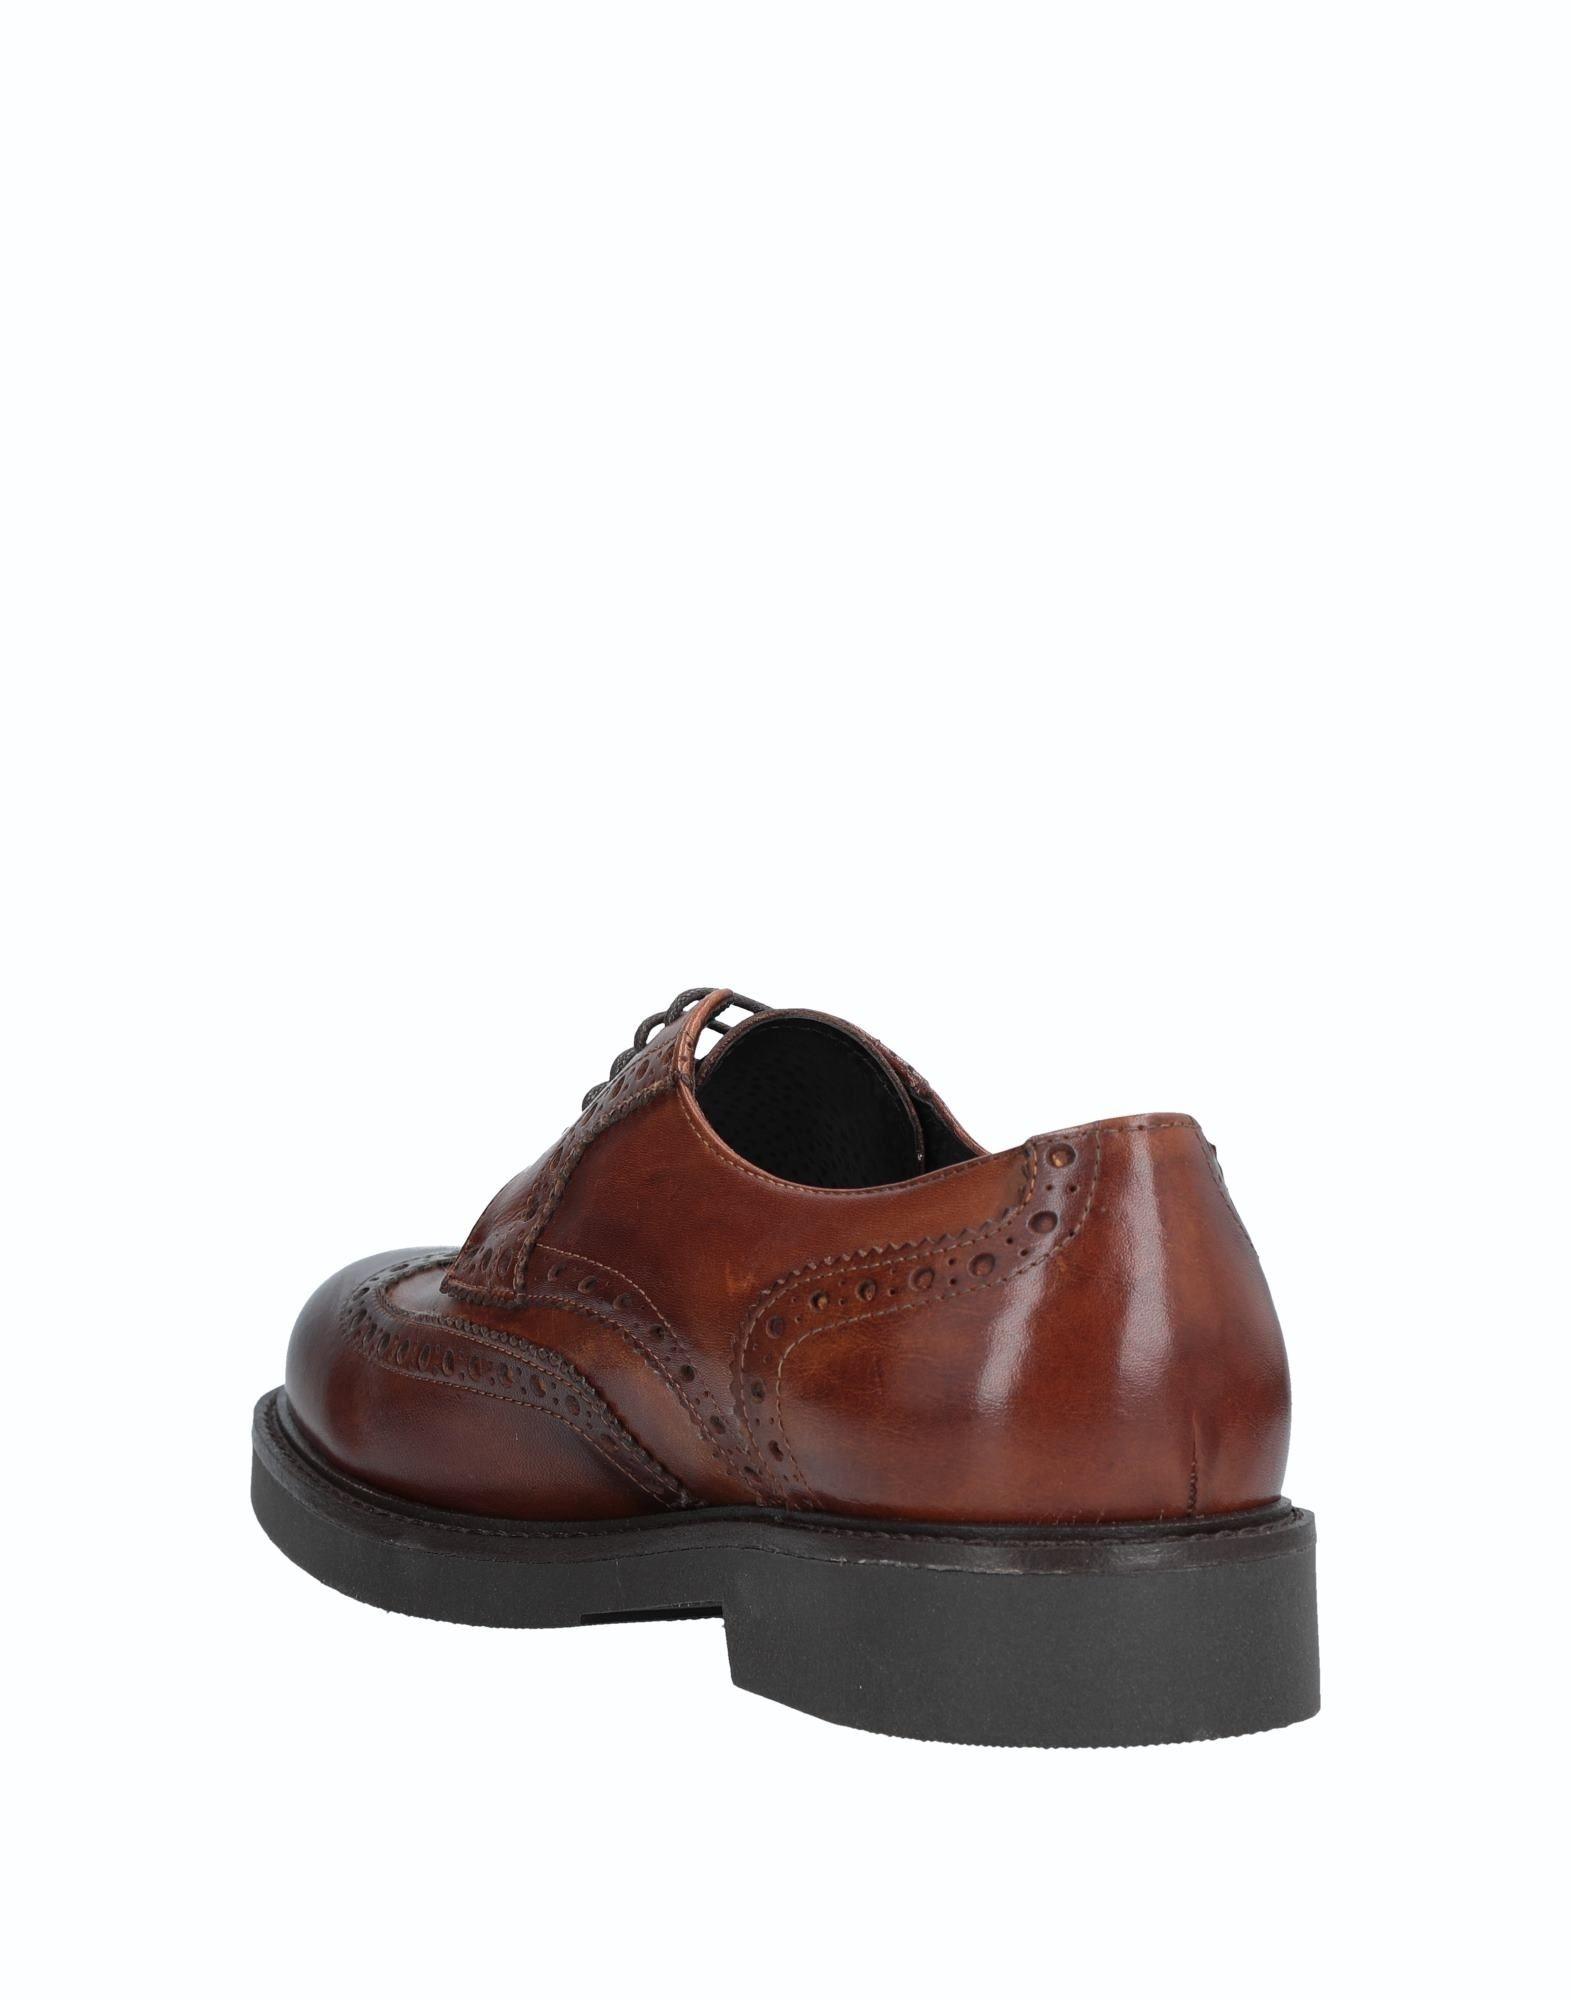 Rabatt echte  Schuhe Dama Schnürschuhe Herren  echte 11538948OV 67b755